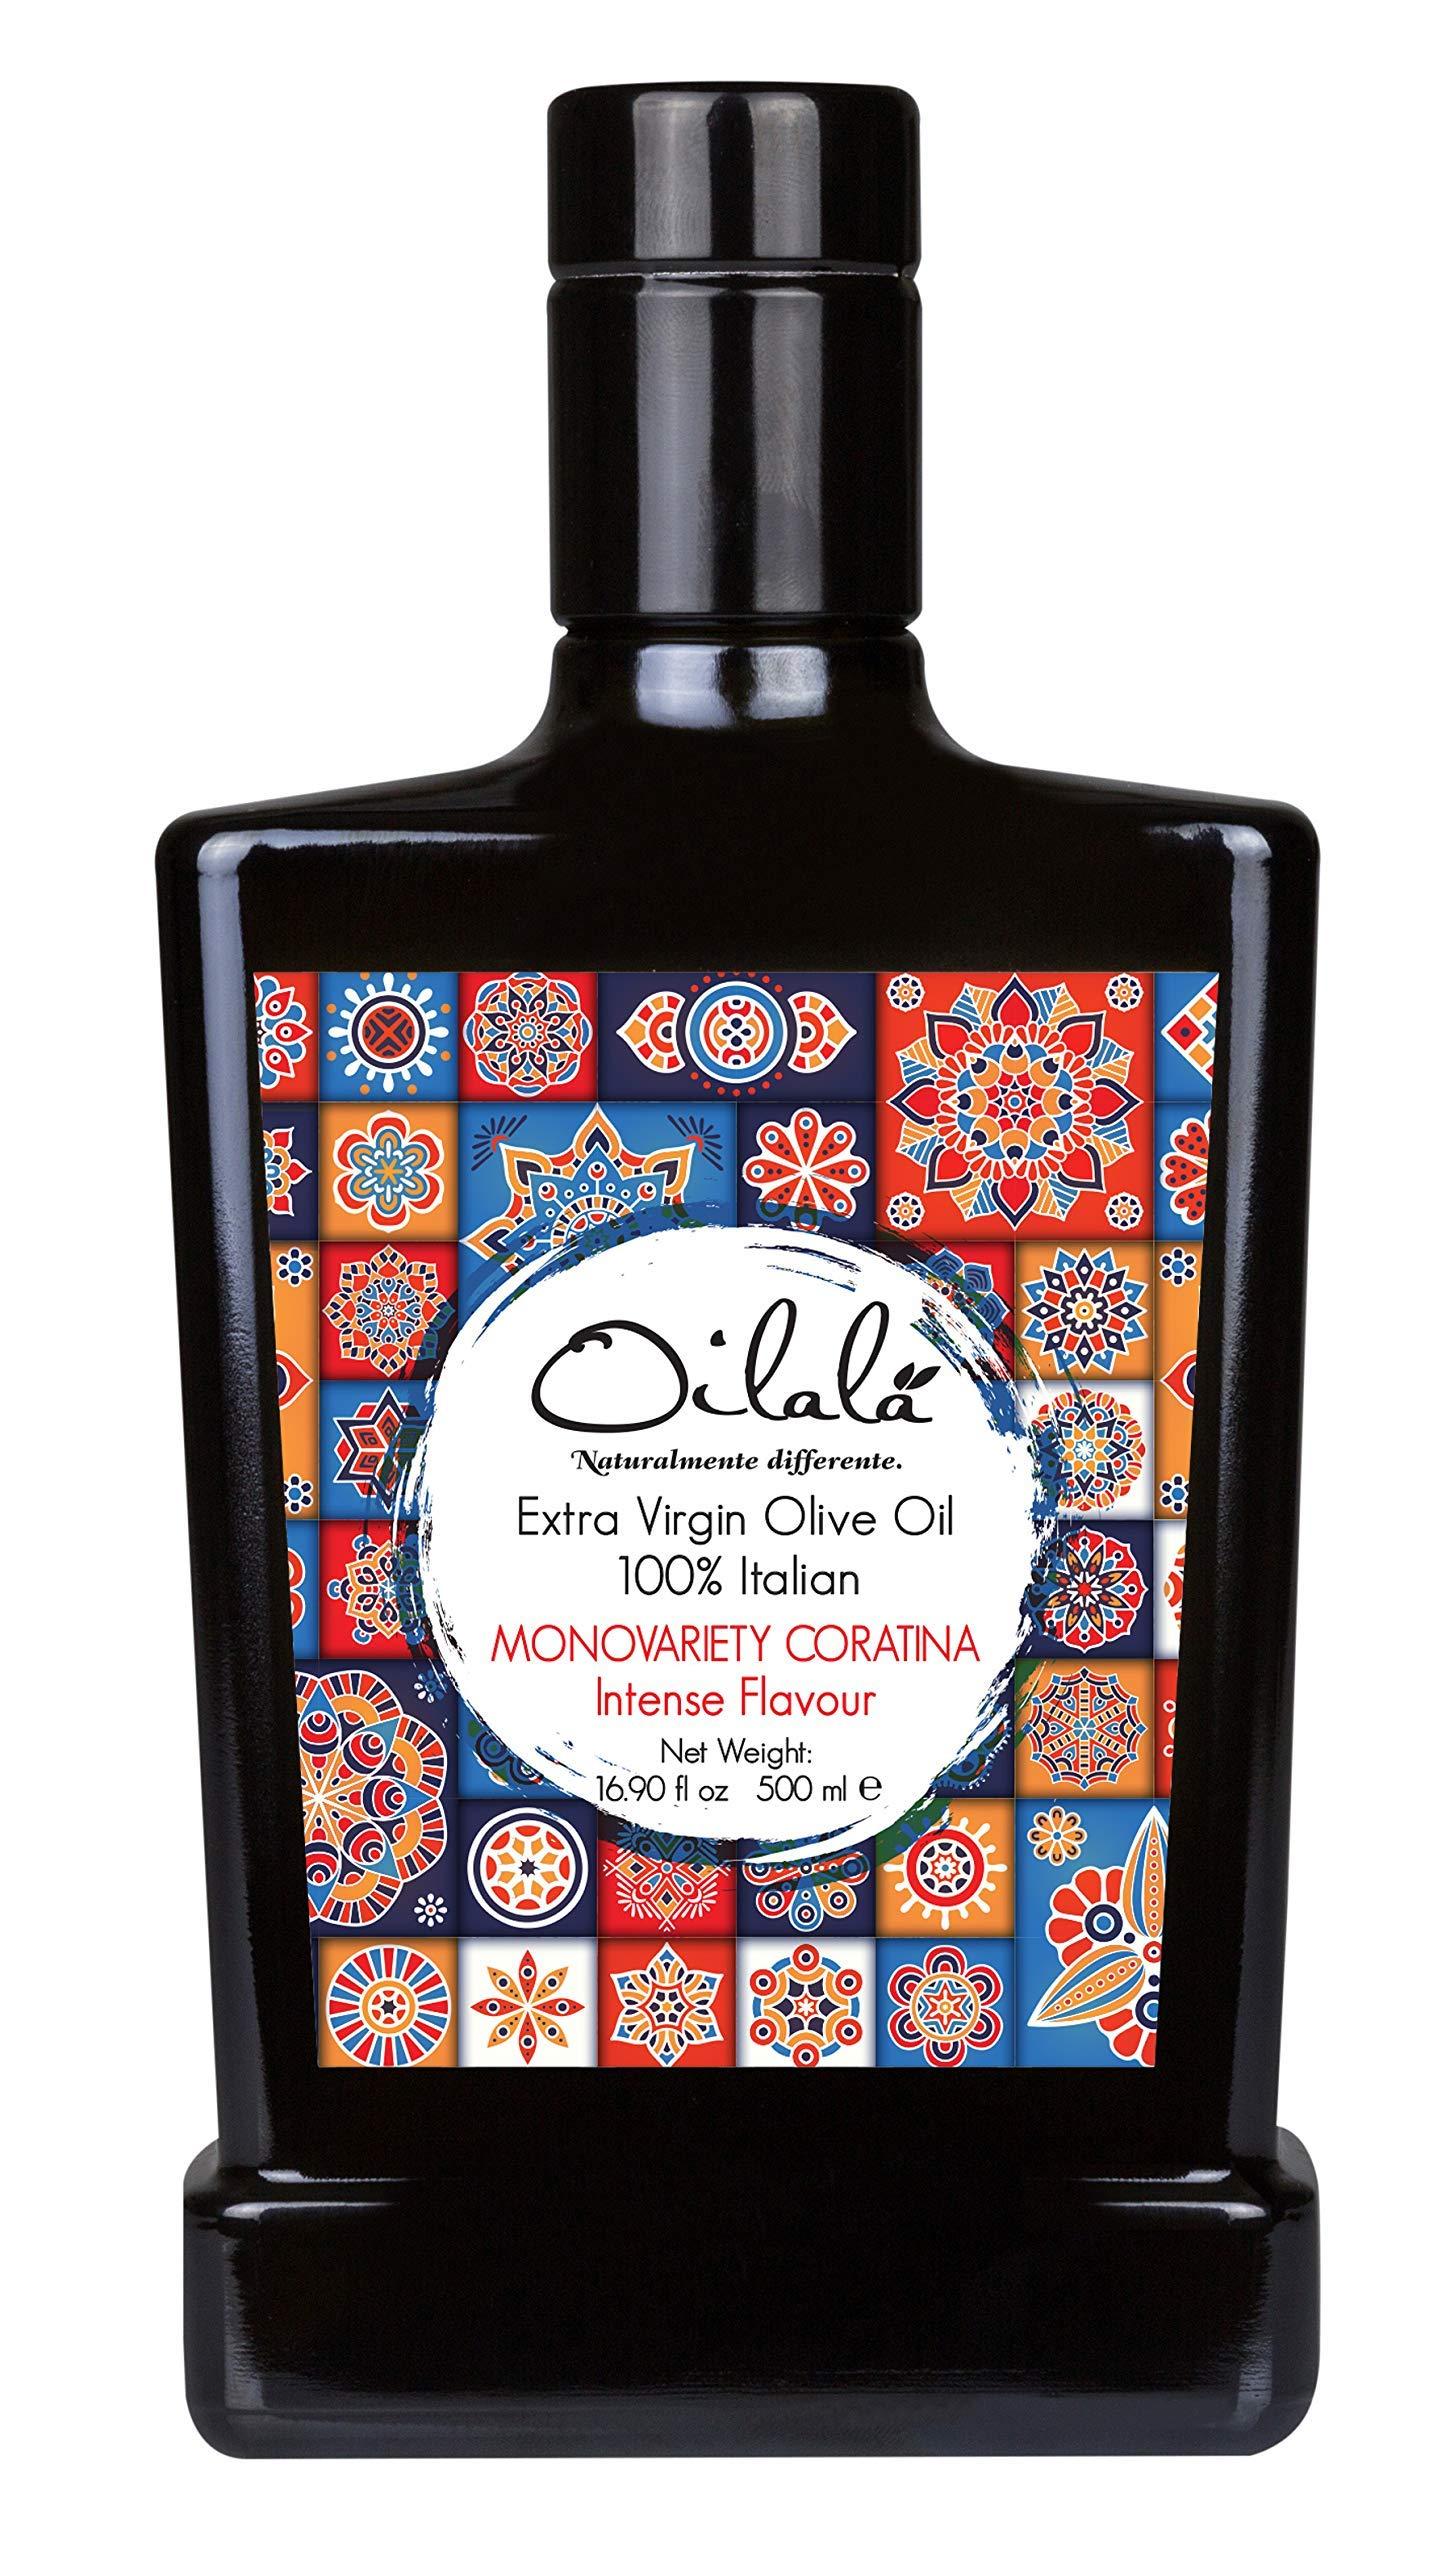 2020/21 Harvest! Oilala Extra Virgin Olive Oil, Robust Flavor, 2020 Gold Medal NYIOOC! filtered, Italian Family Farm Puglia, Italy, Coratina, Polyphenol rich, 500ml (16.9 FL Oz)